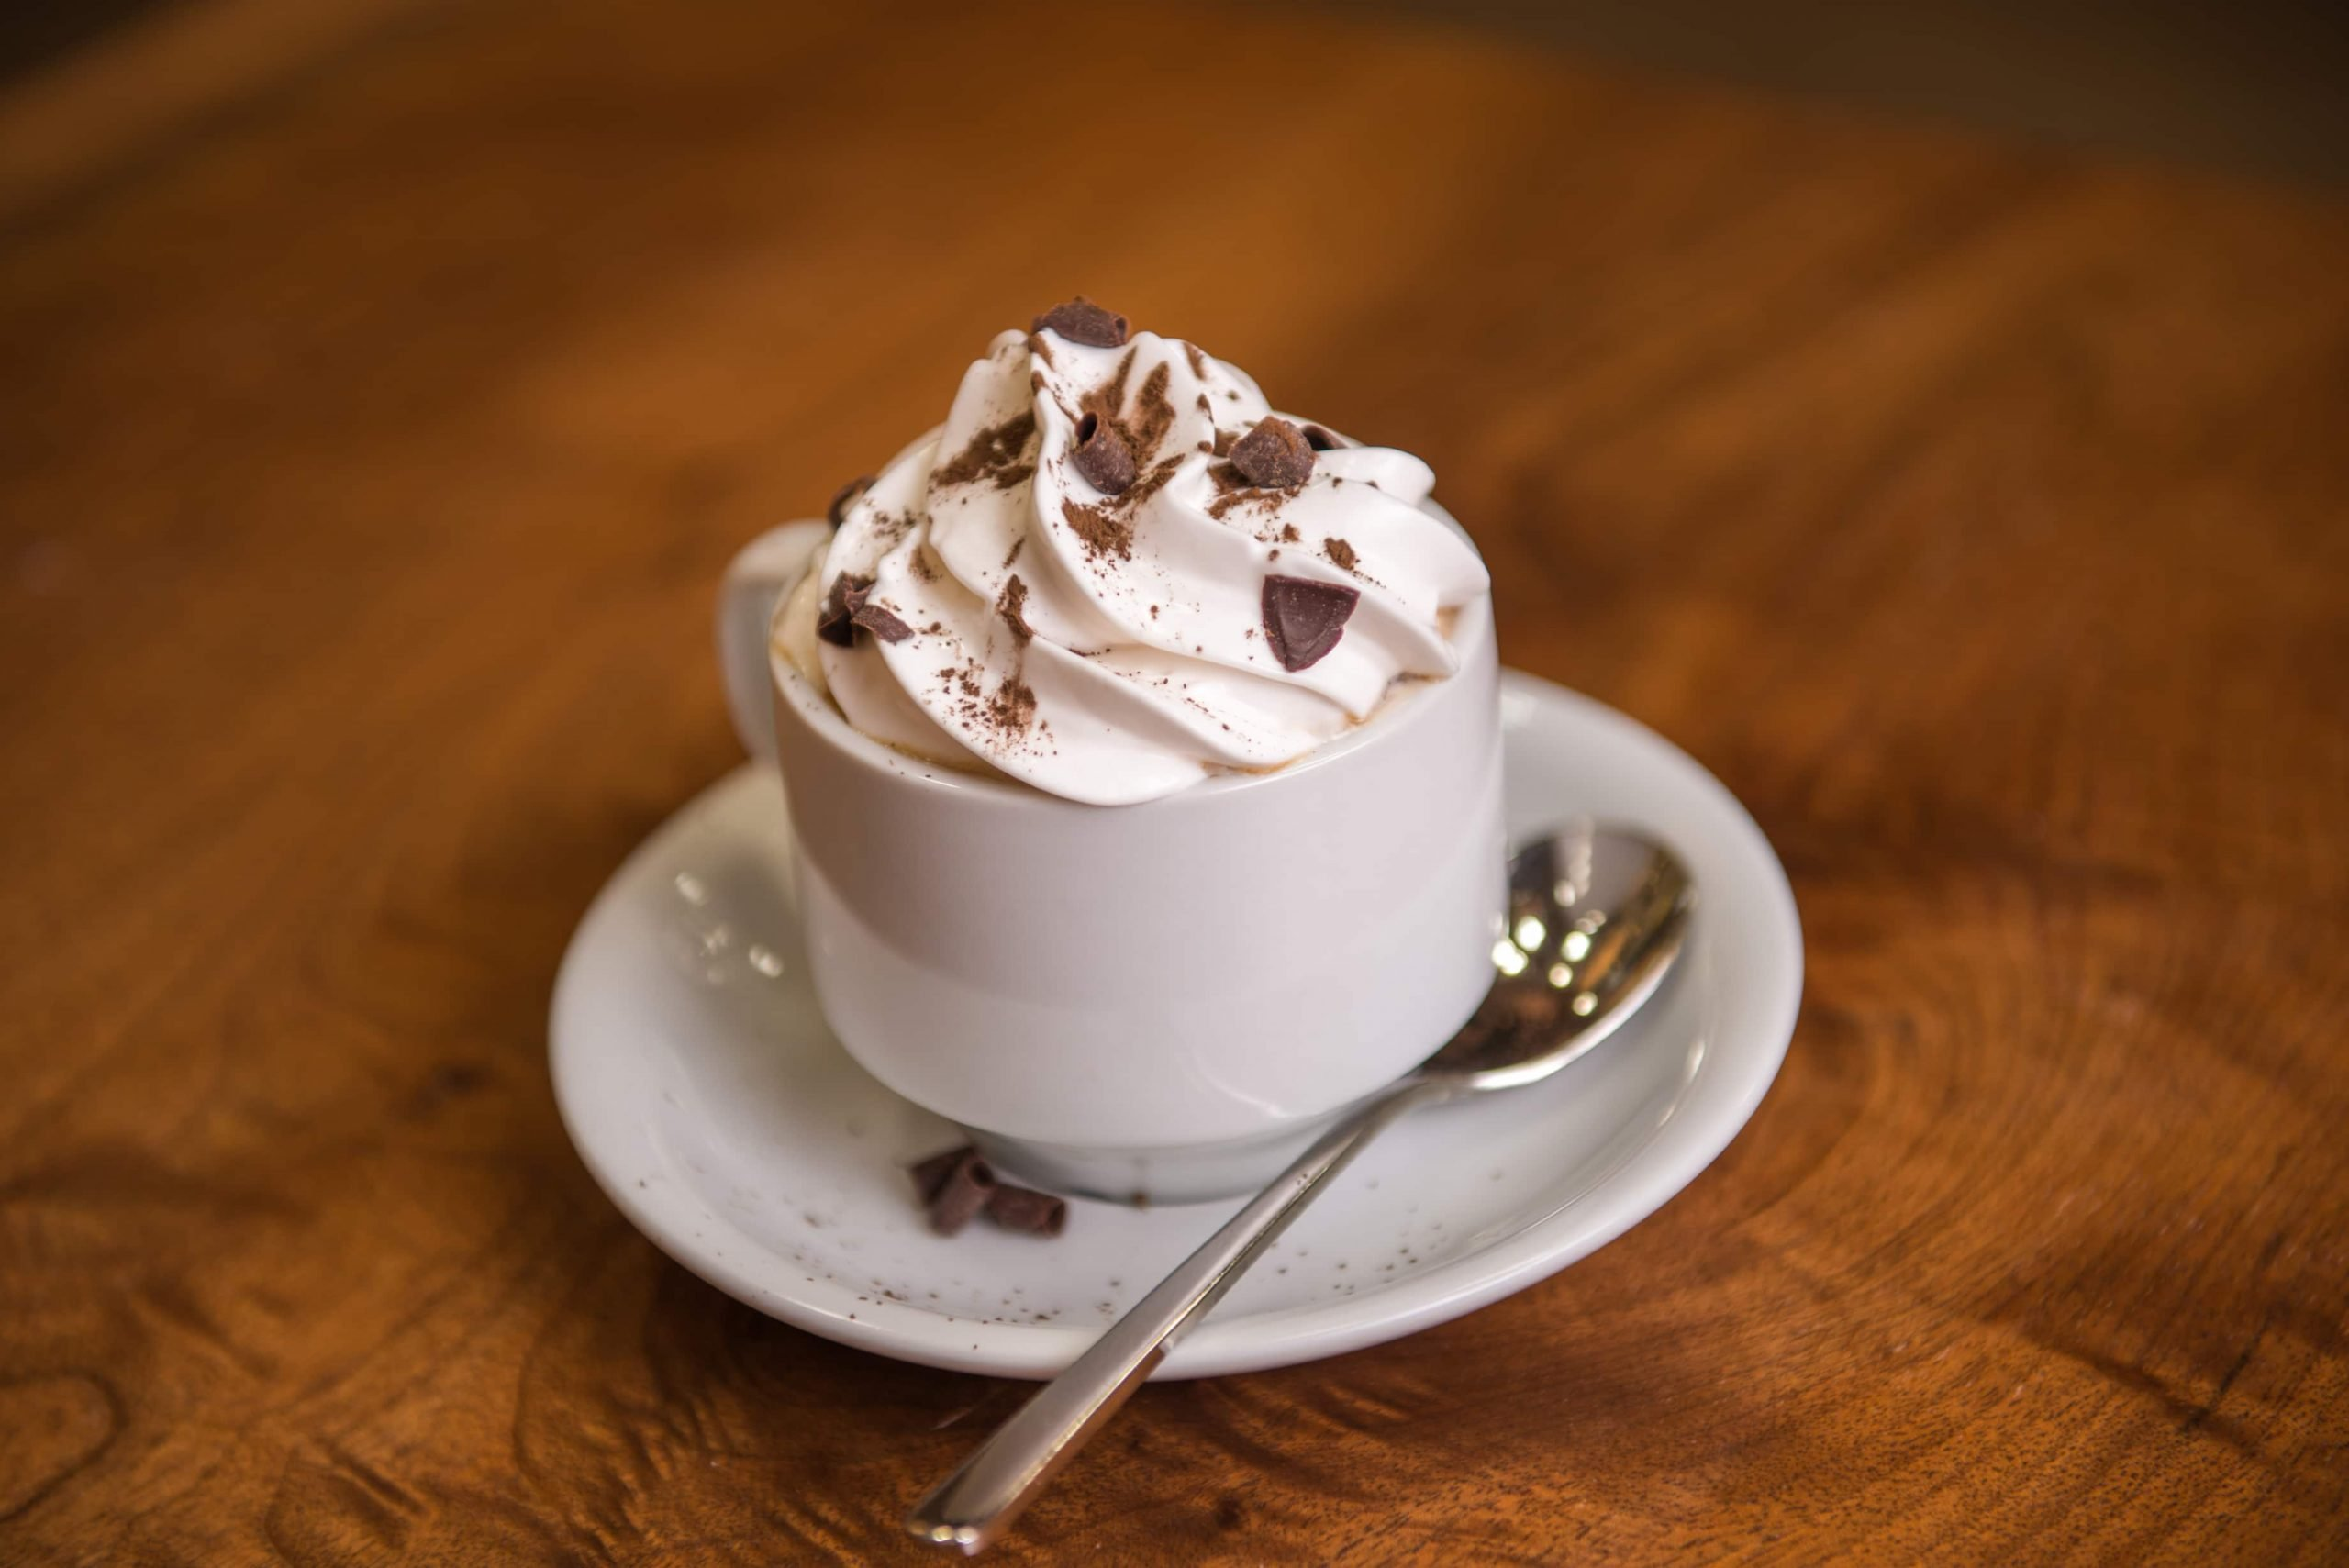 New report ranks Virginia Beach among 'Best Coffee Cities' nationwide